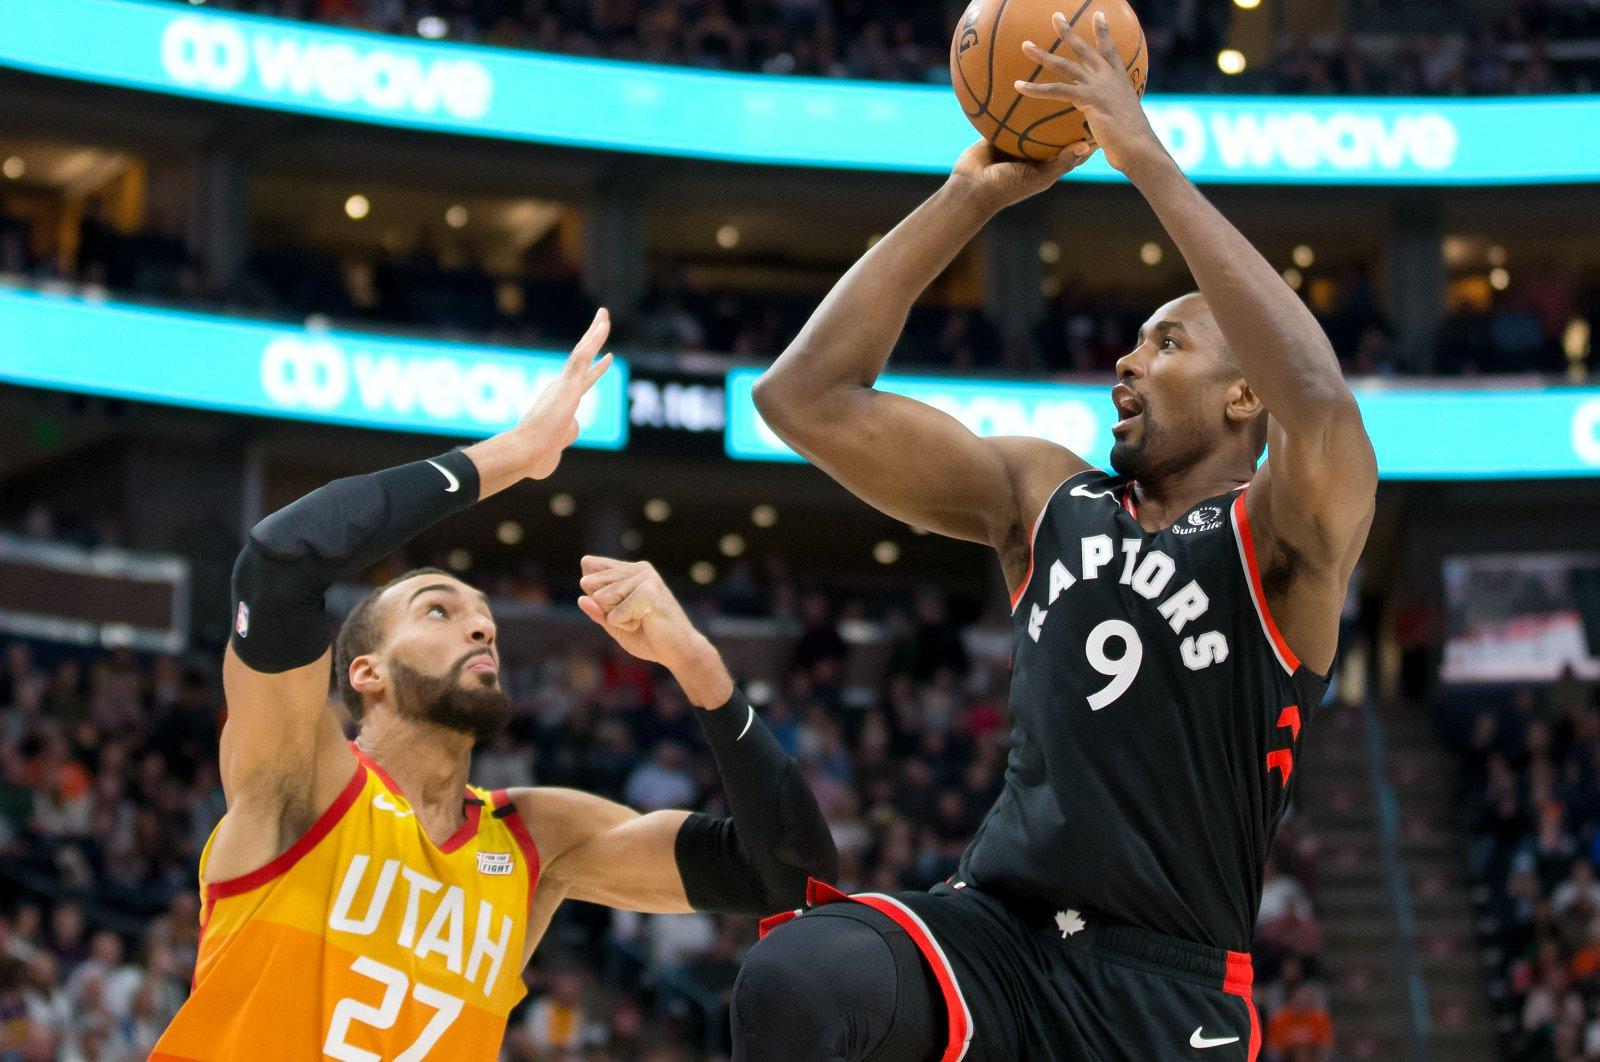 Toronto Raptors center Ibaka shoots the ball against Utah Jazz center Gobert during an NBA match in Salt Lake City, March 9, 2020. (Reuters Photo)